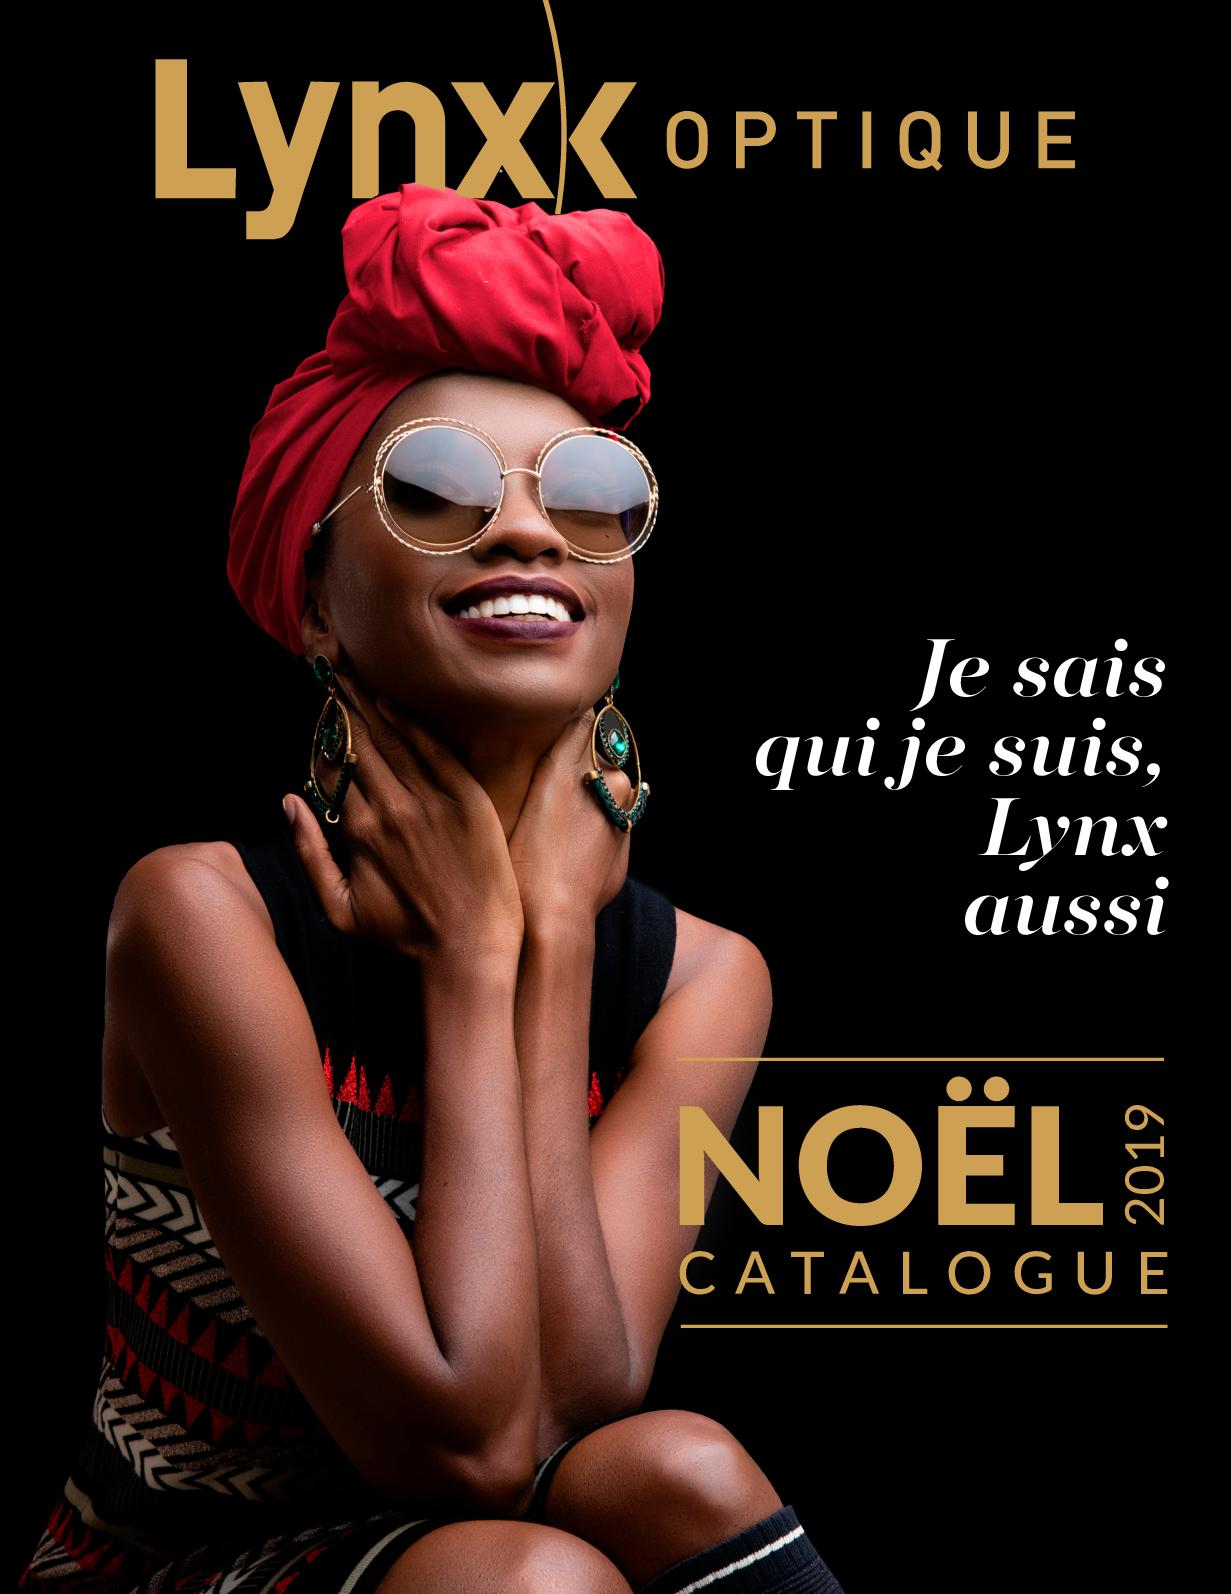 Catalogue Noel Solaire Lynx 2019